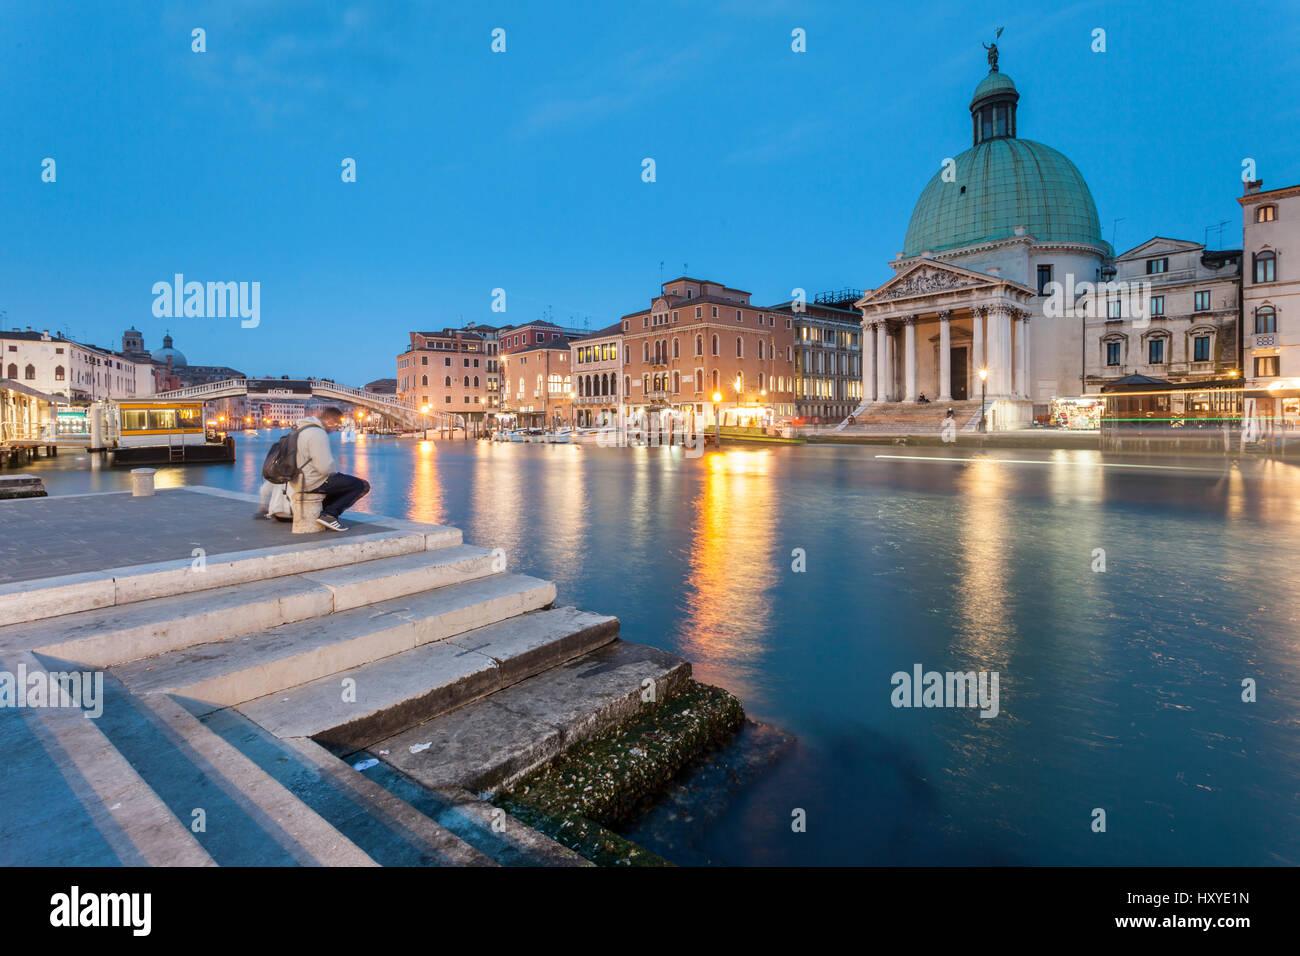 Nacht fällt auf den Canal Grande in Venedig, Italien. Berühmte Kuppel von San Simeone Piccolo. Stockbild